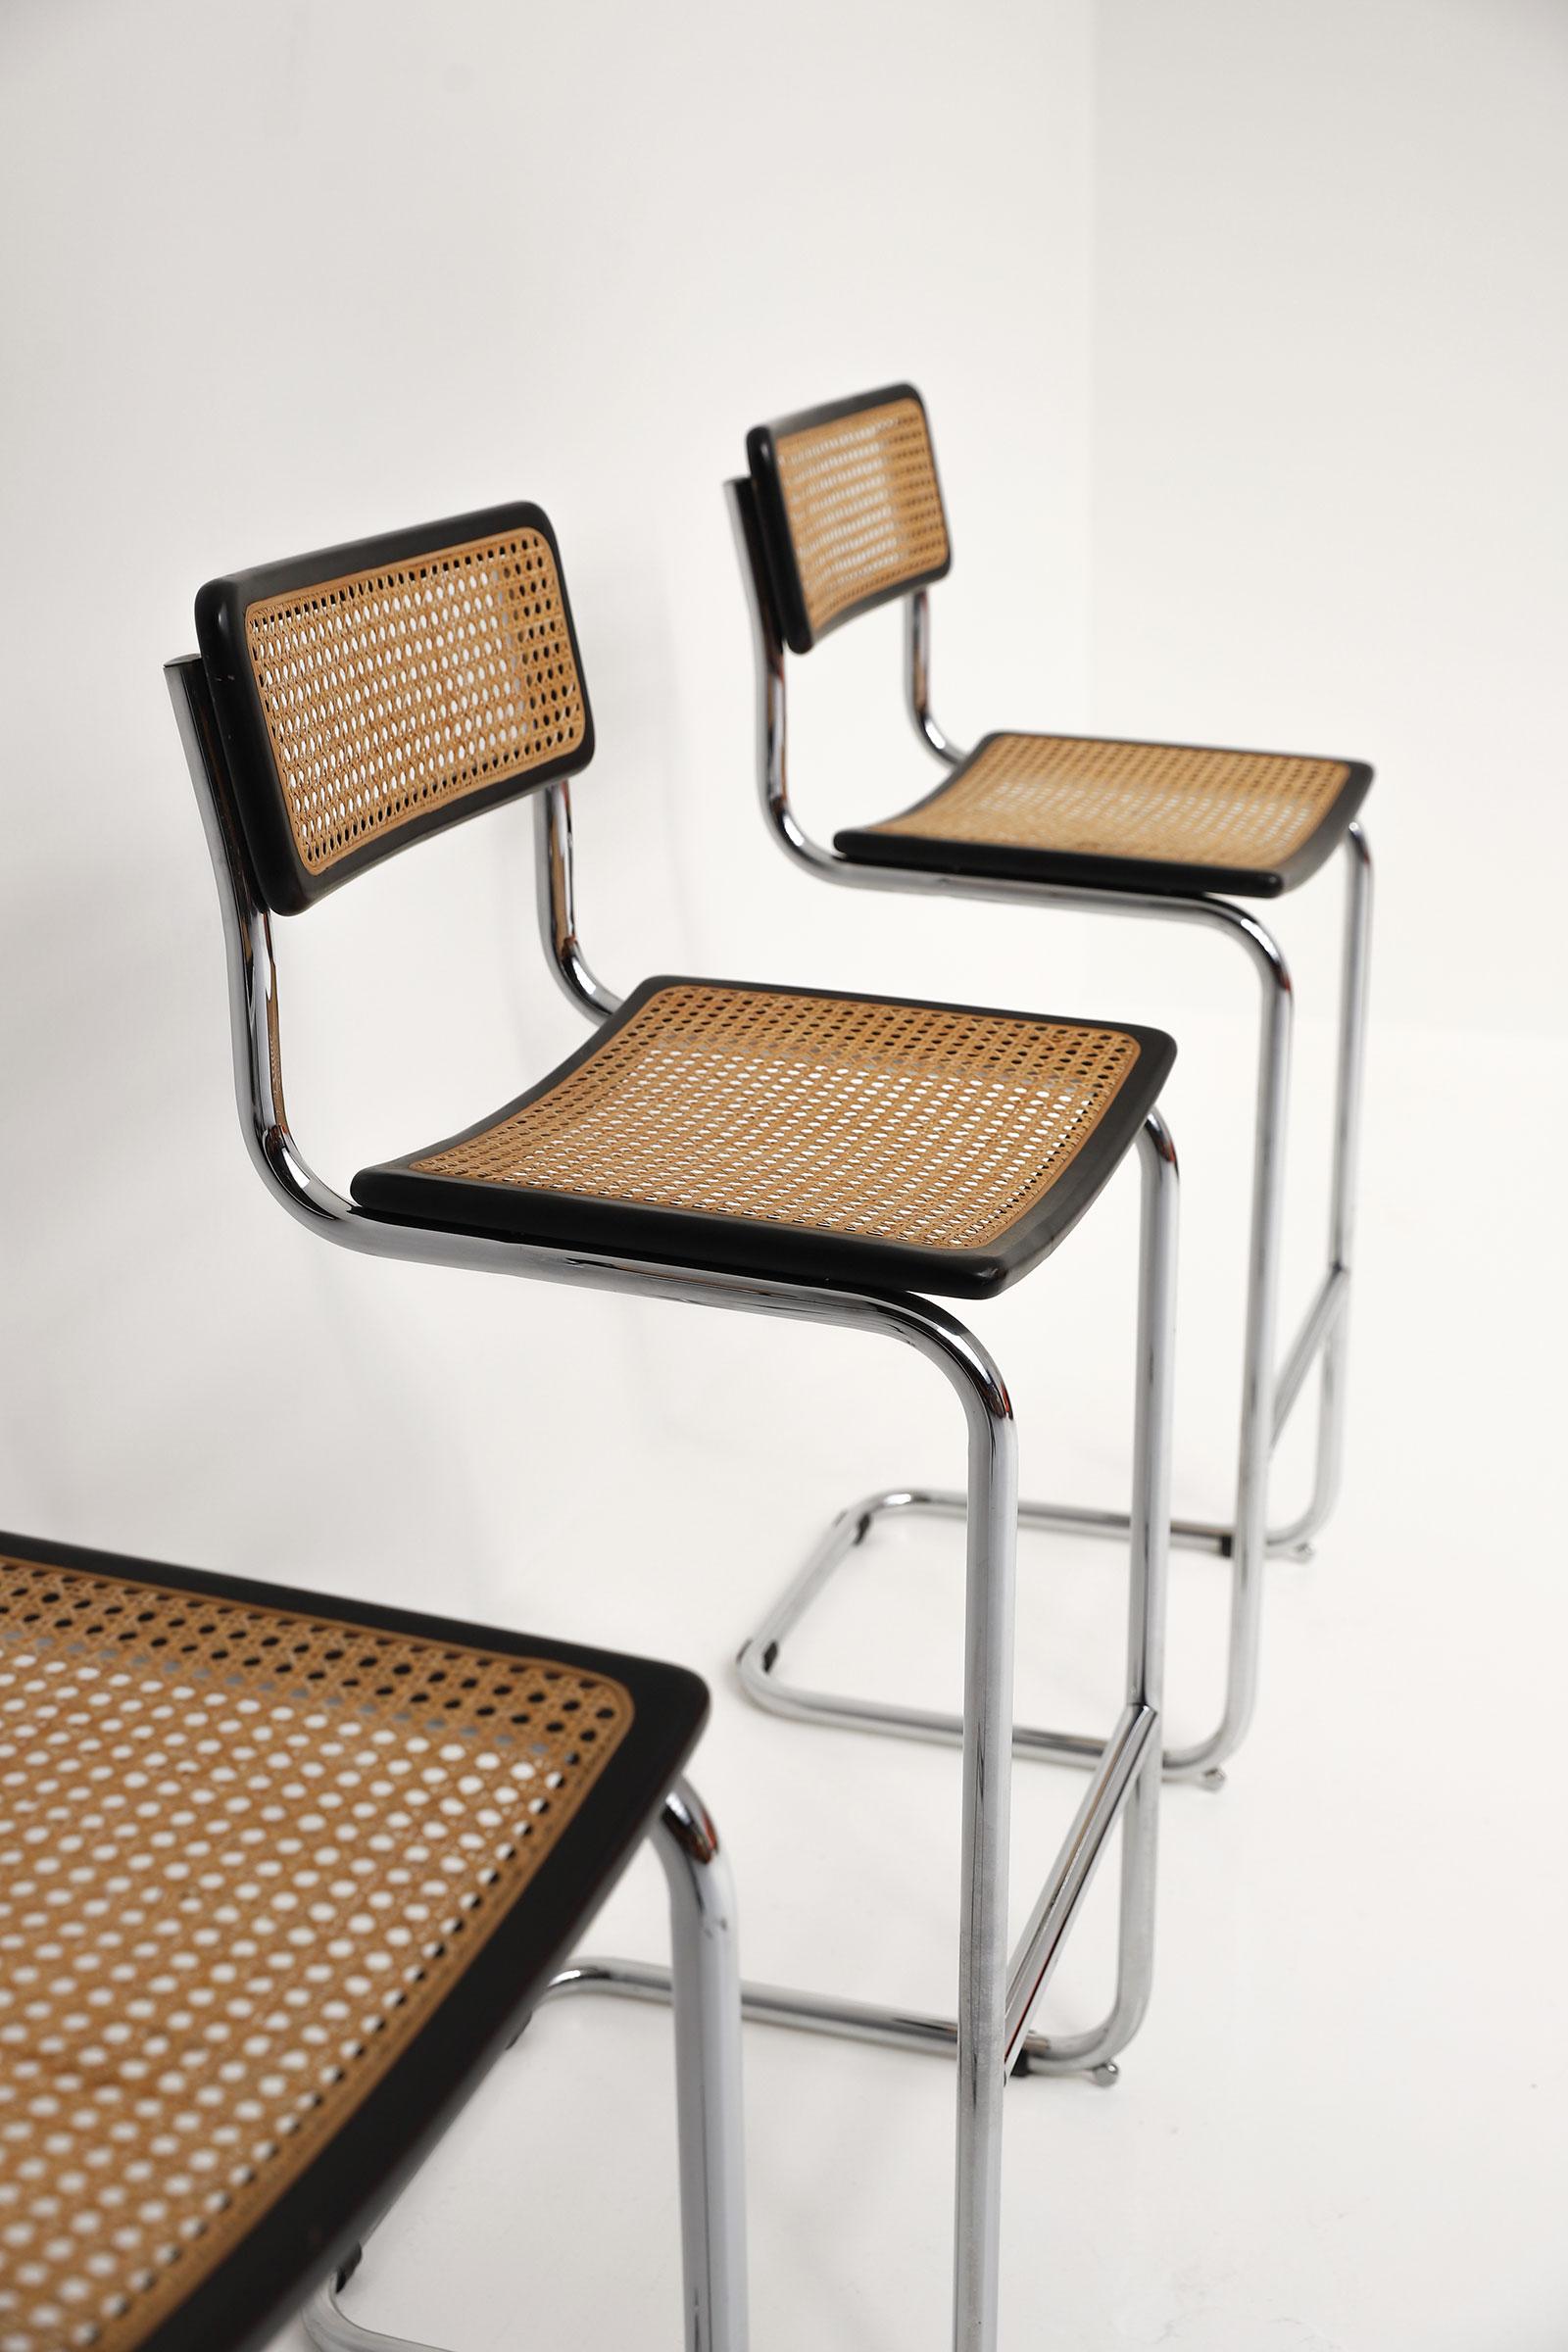 Cesca cantilever bar stools image 4